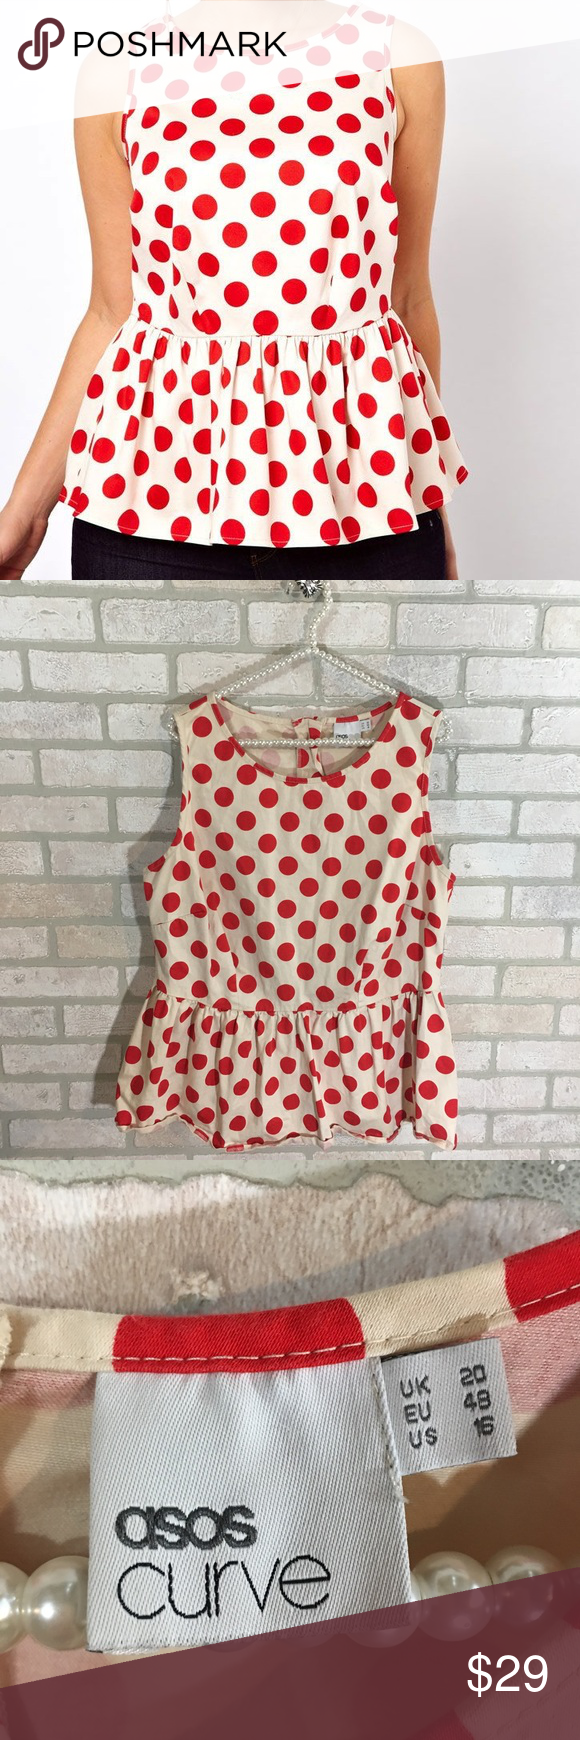 7e1d8c9ffcf4c ASOS Curve Polka Dot Peplum Top Size  16 97% cotton 3% elastane Sleeveless  Zips up the back White background with red polka dots Peplum Top Approx ...